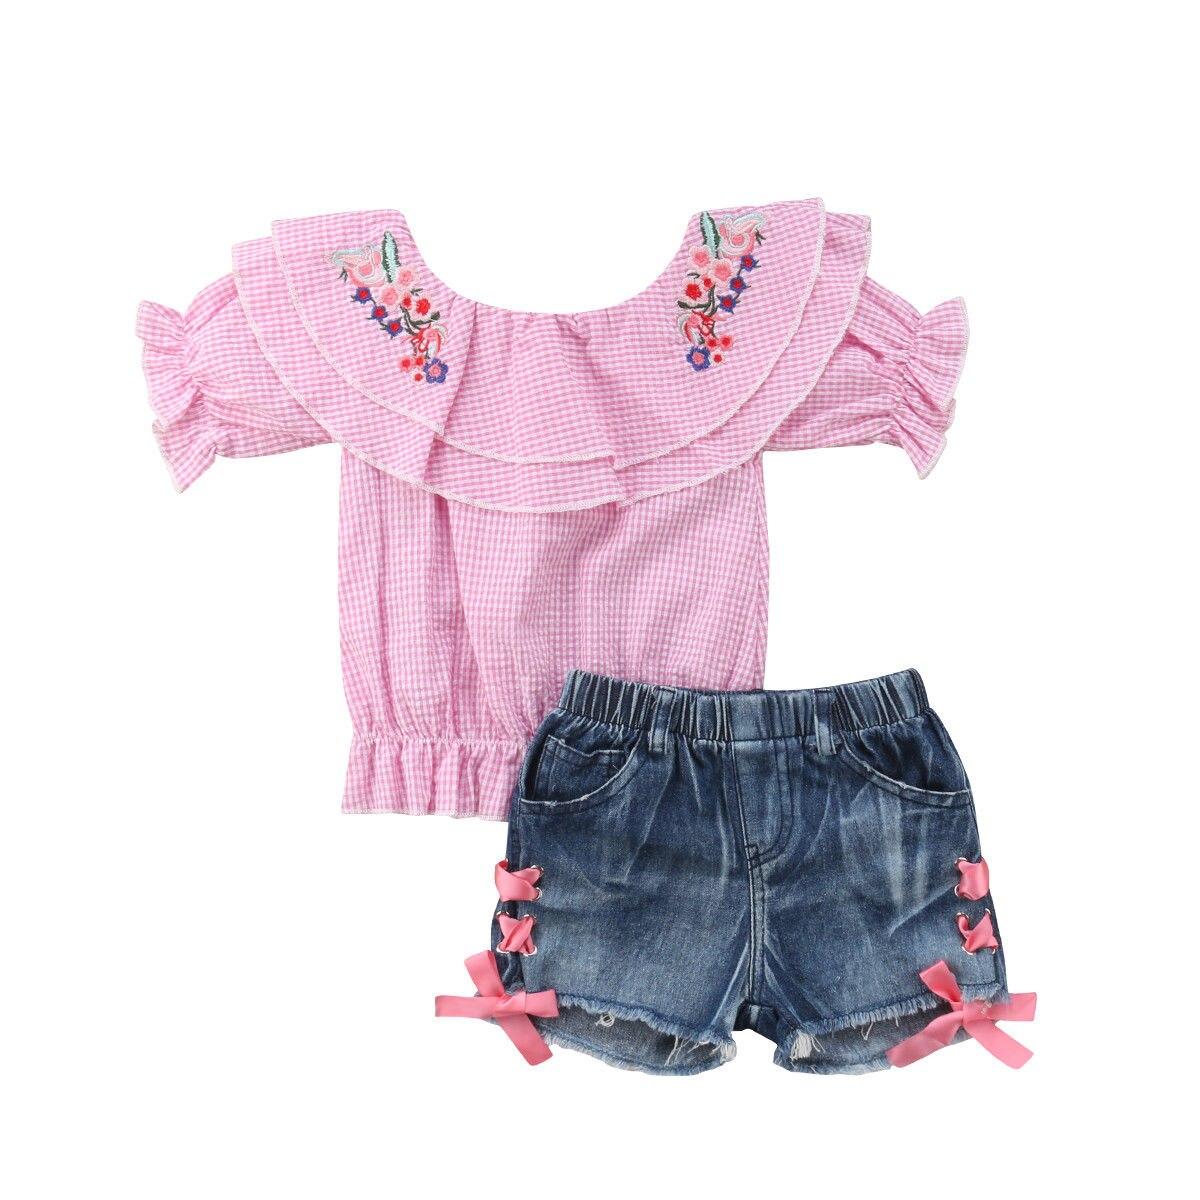 1-6T Little Girls Summer Clothes Sets Kids Girl Lovely Baby Off Shoulder Flower Tops Denim Shorts Outfit